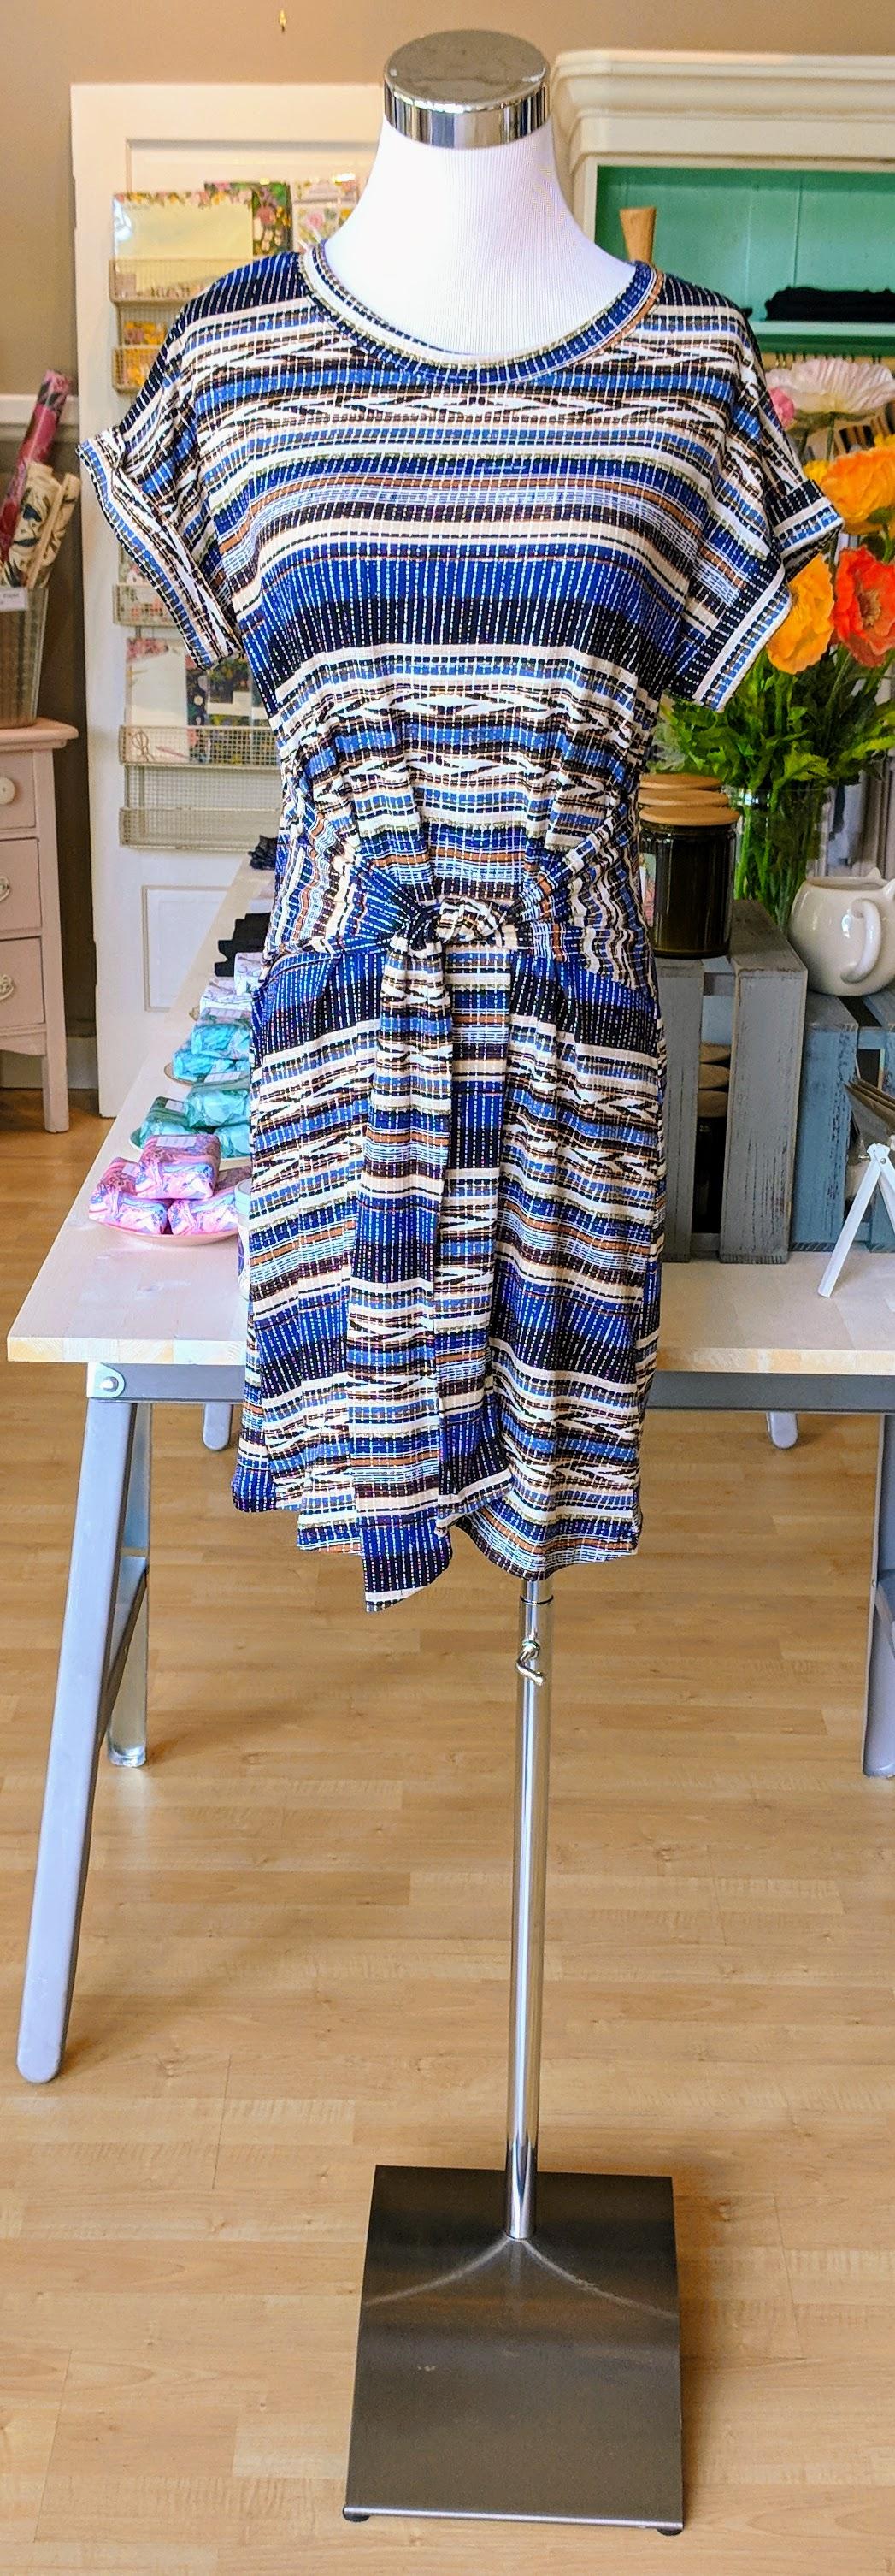 Blue multi pattern midi dress with tie waist accent.